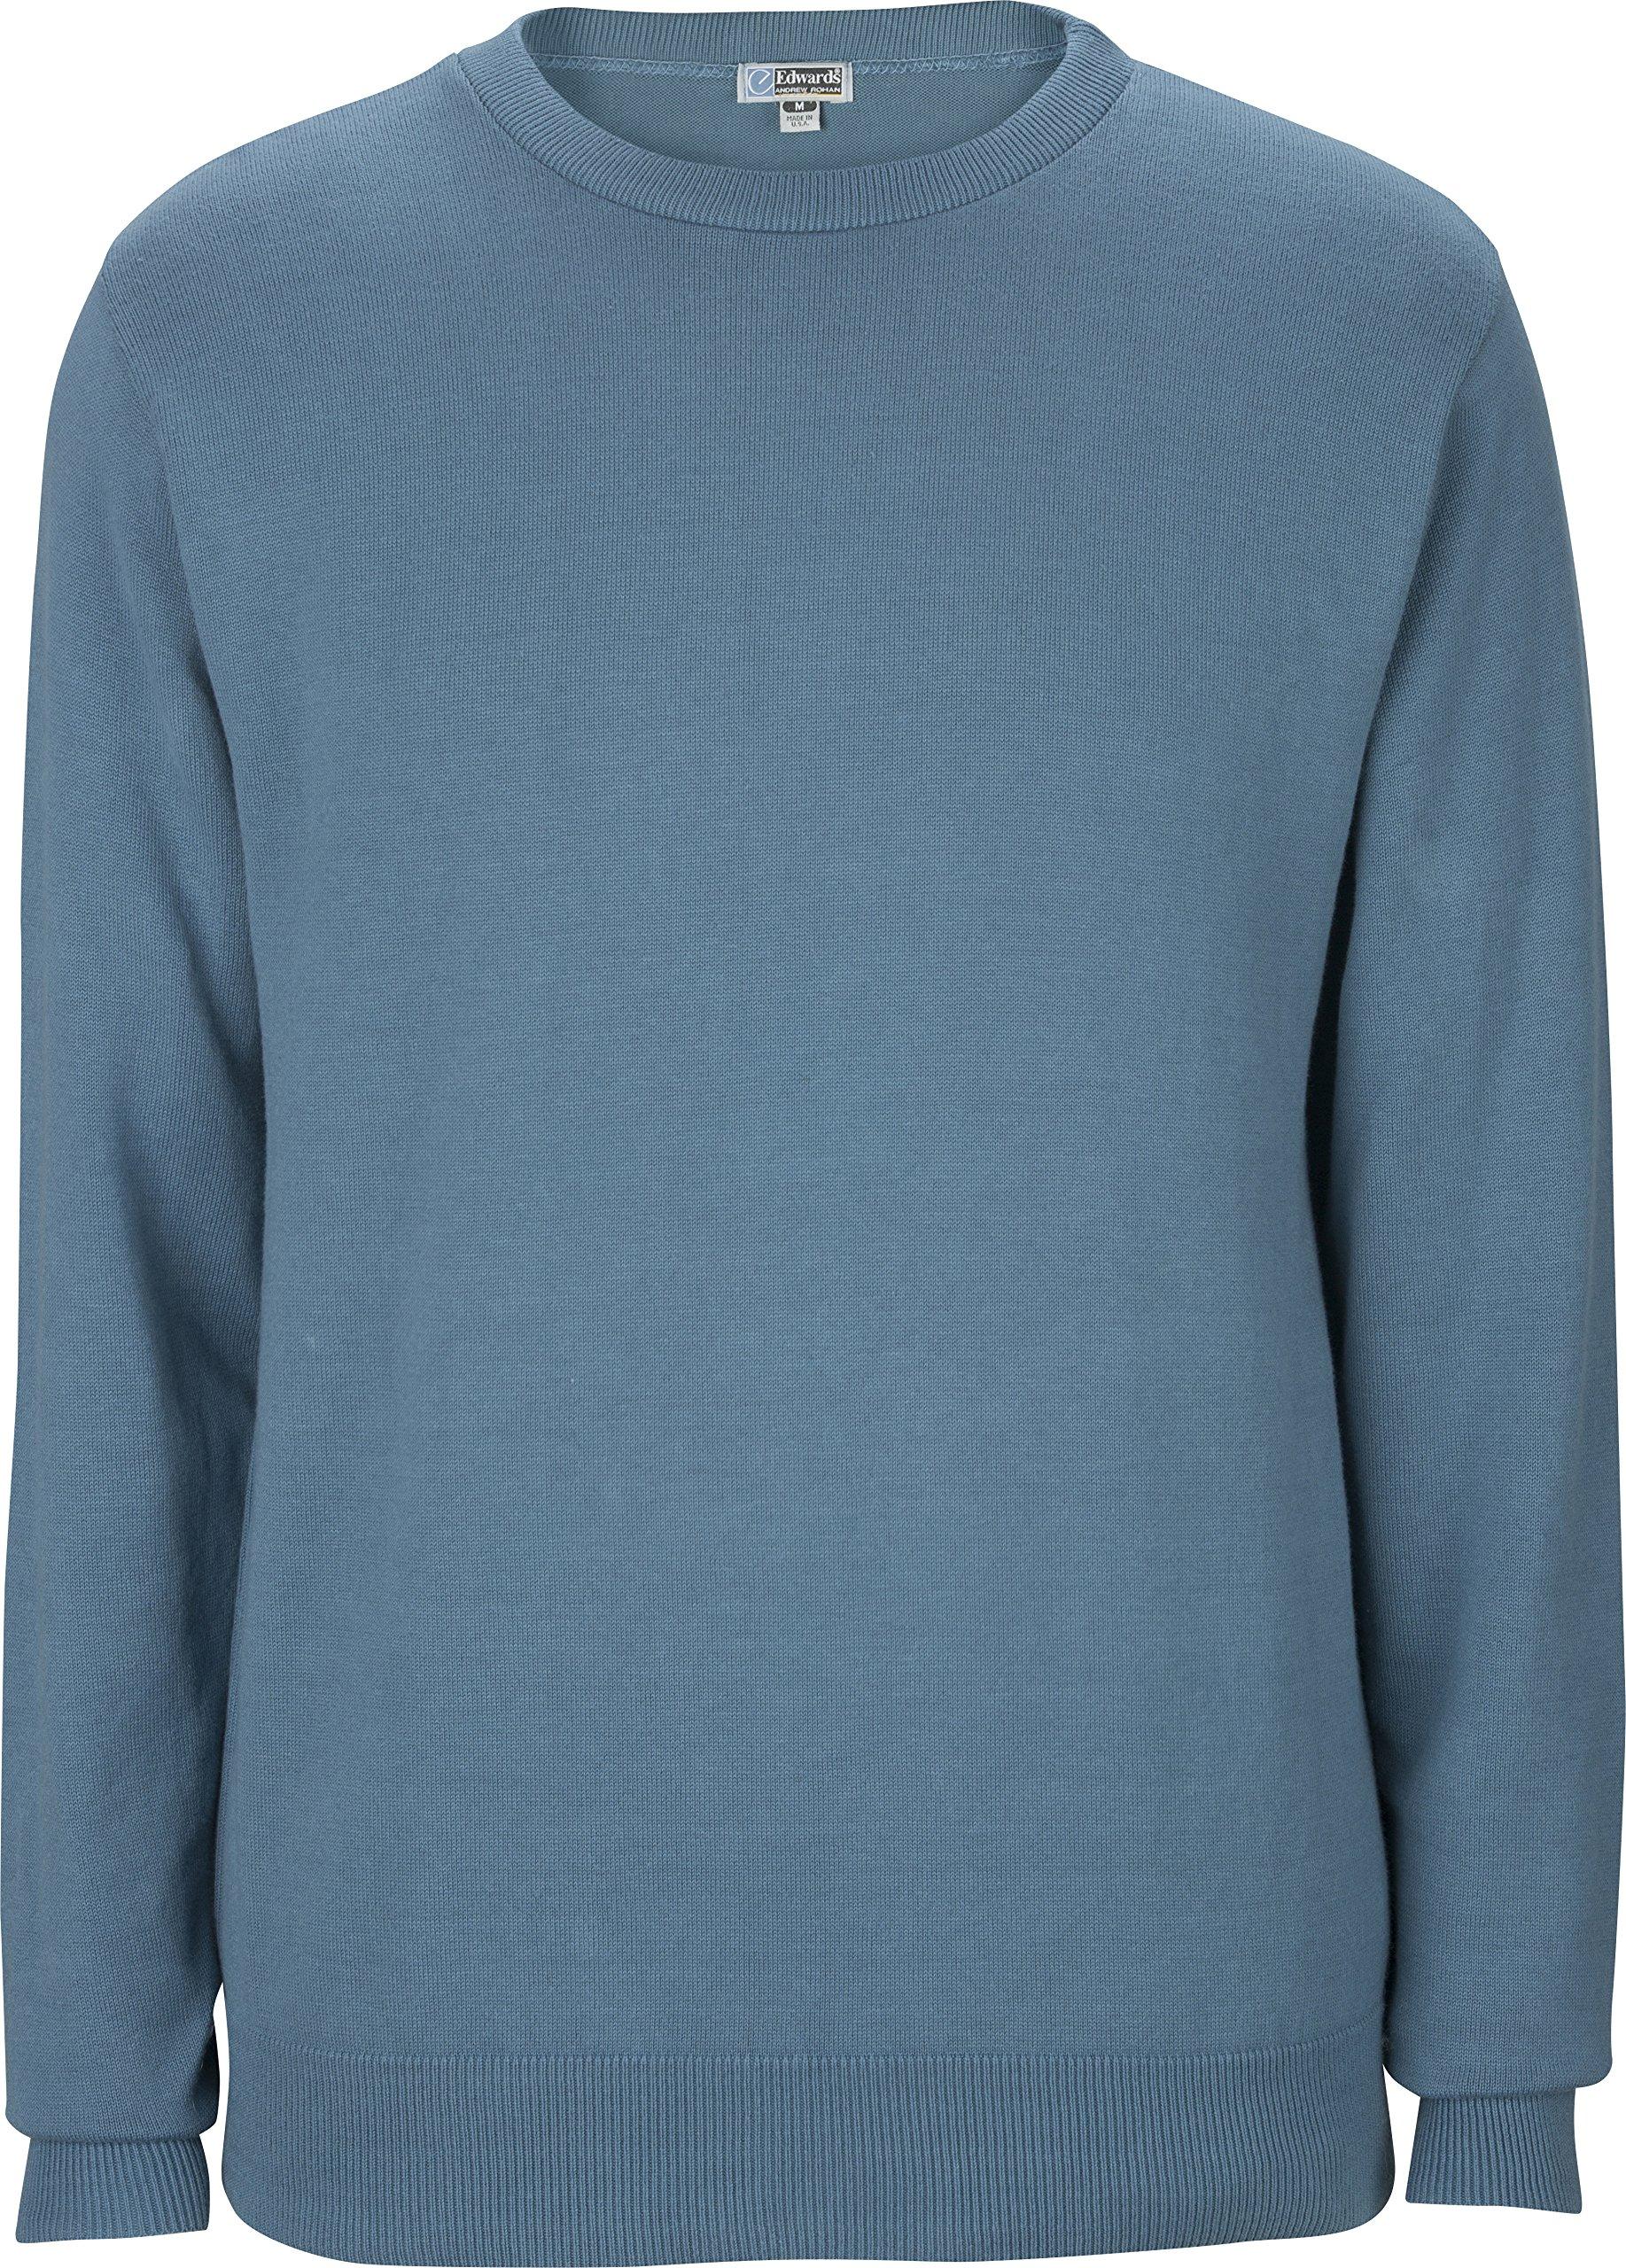 Averill's Sharper Uniforms Unisex Cotton Blend Crew Neck Sweater Medium Slate Blue